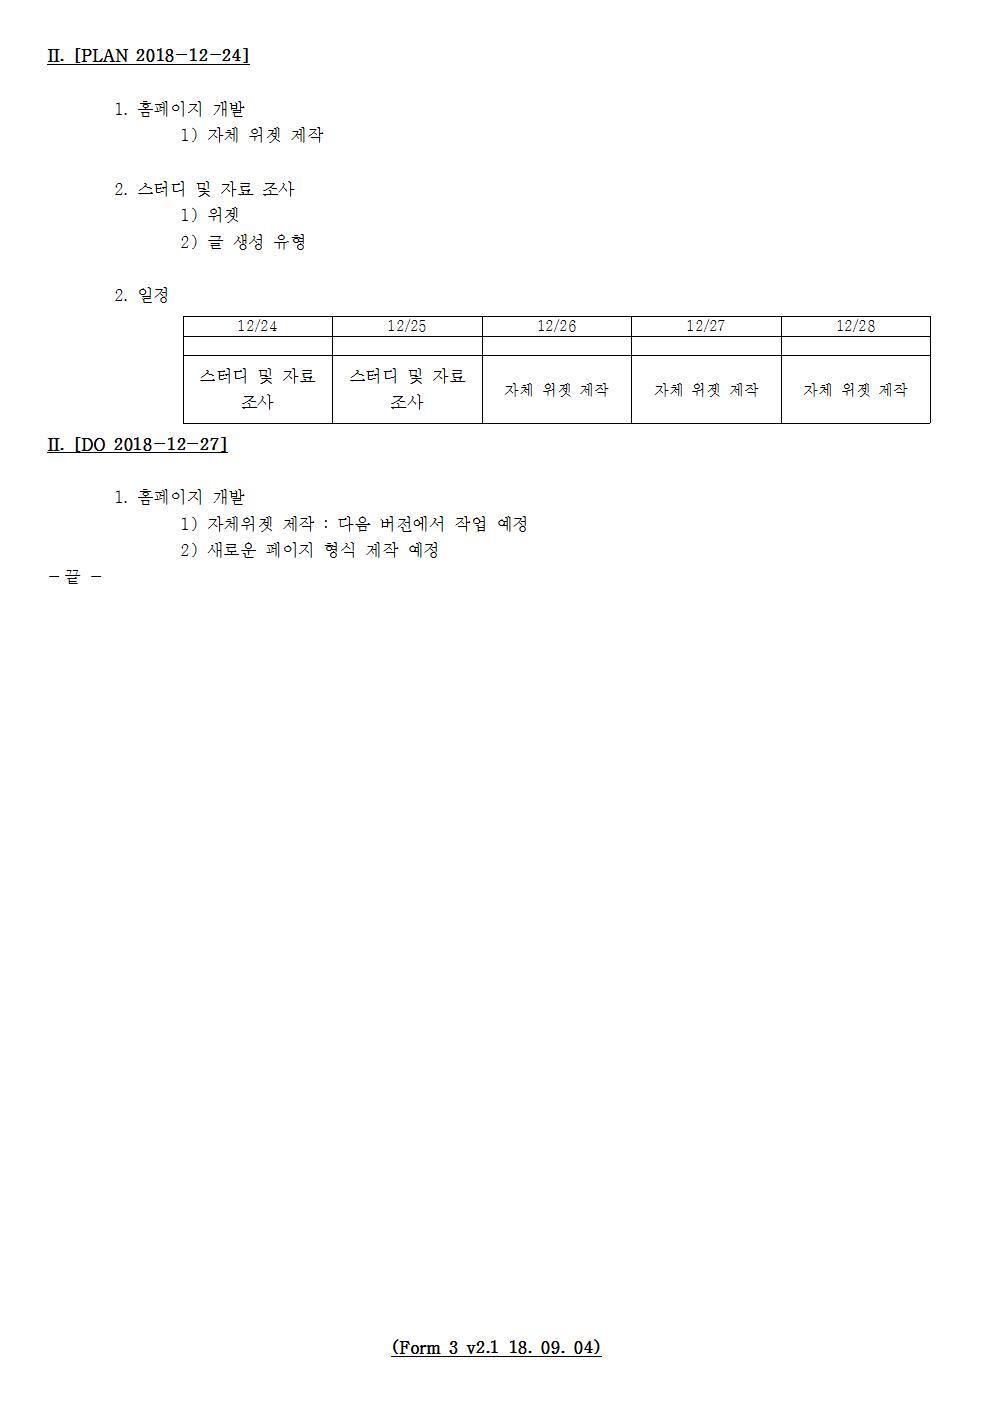 D-[18-047-BZ-07]-[BZEN HP v3.0]-[2018-12-27][HH]002.jpg